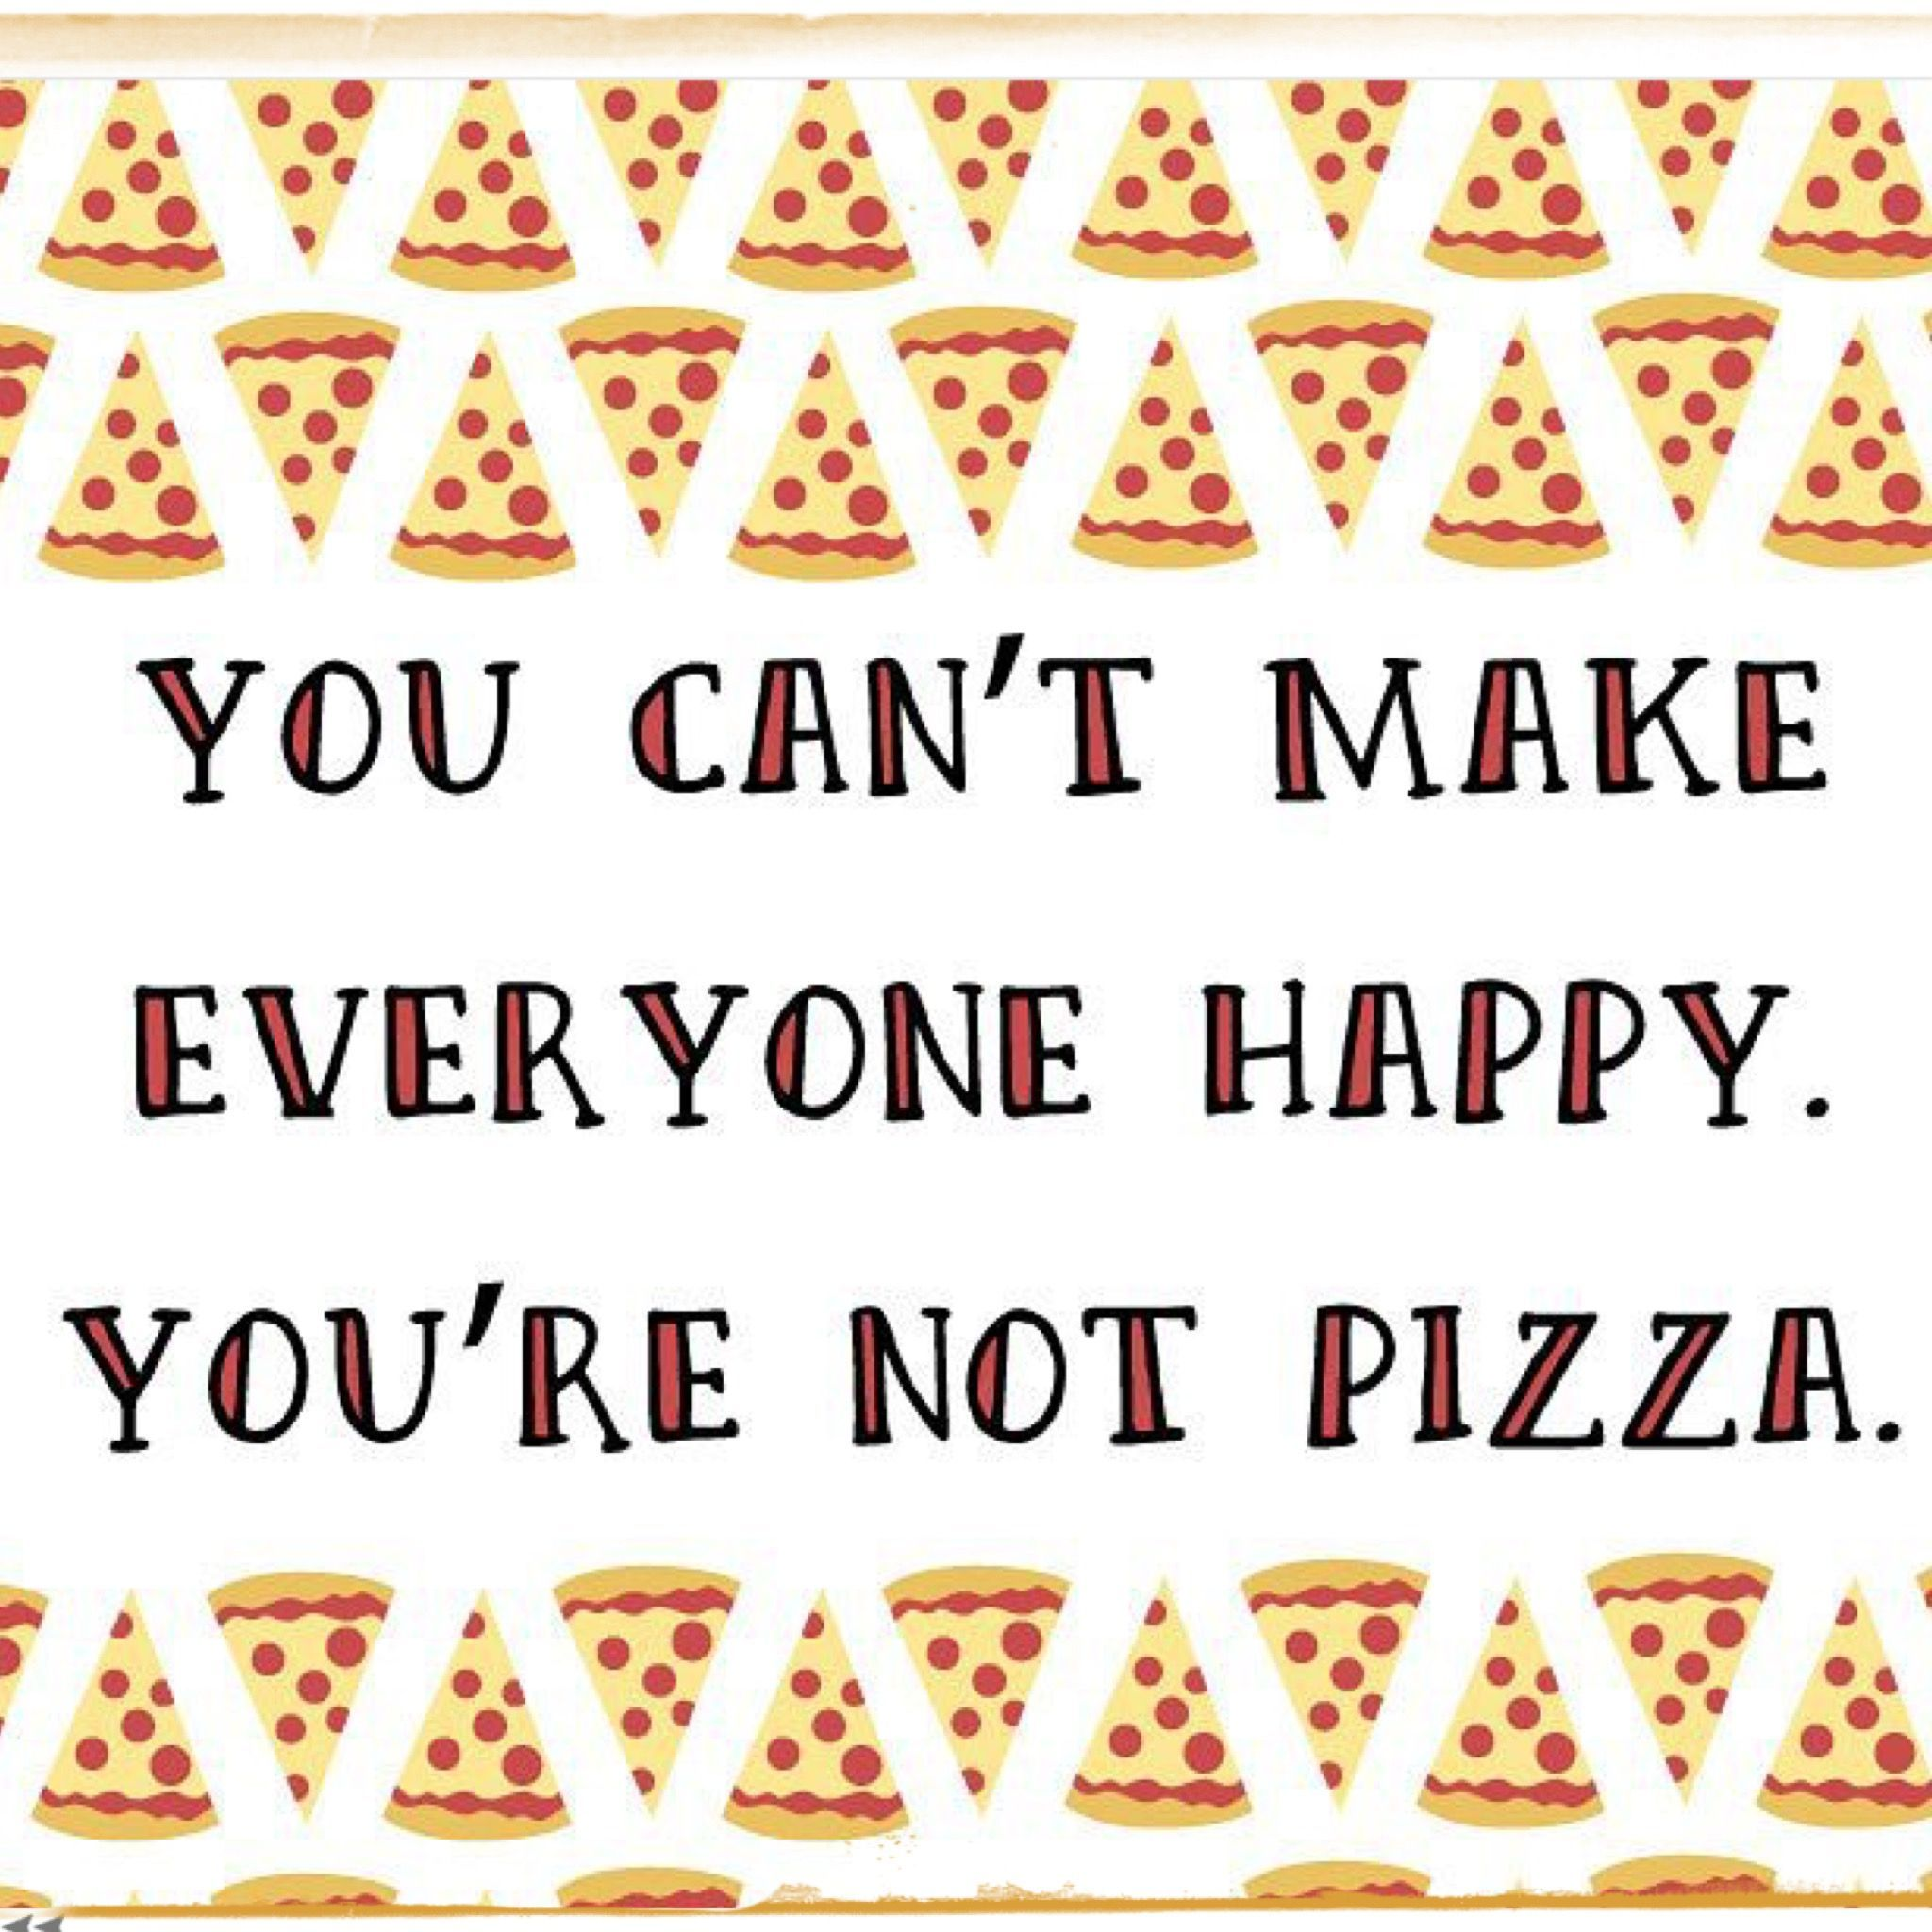 Funny Pizza Quotes Pizza Quotes Funny Pizza Quotes Pizza Funny